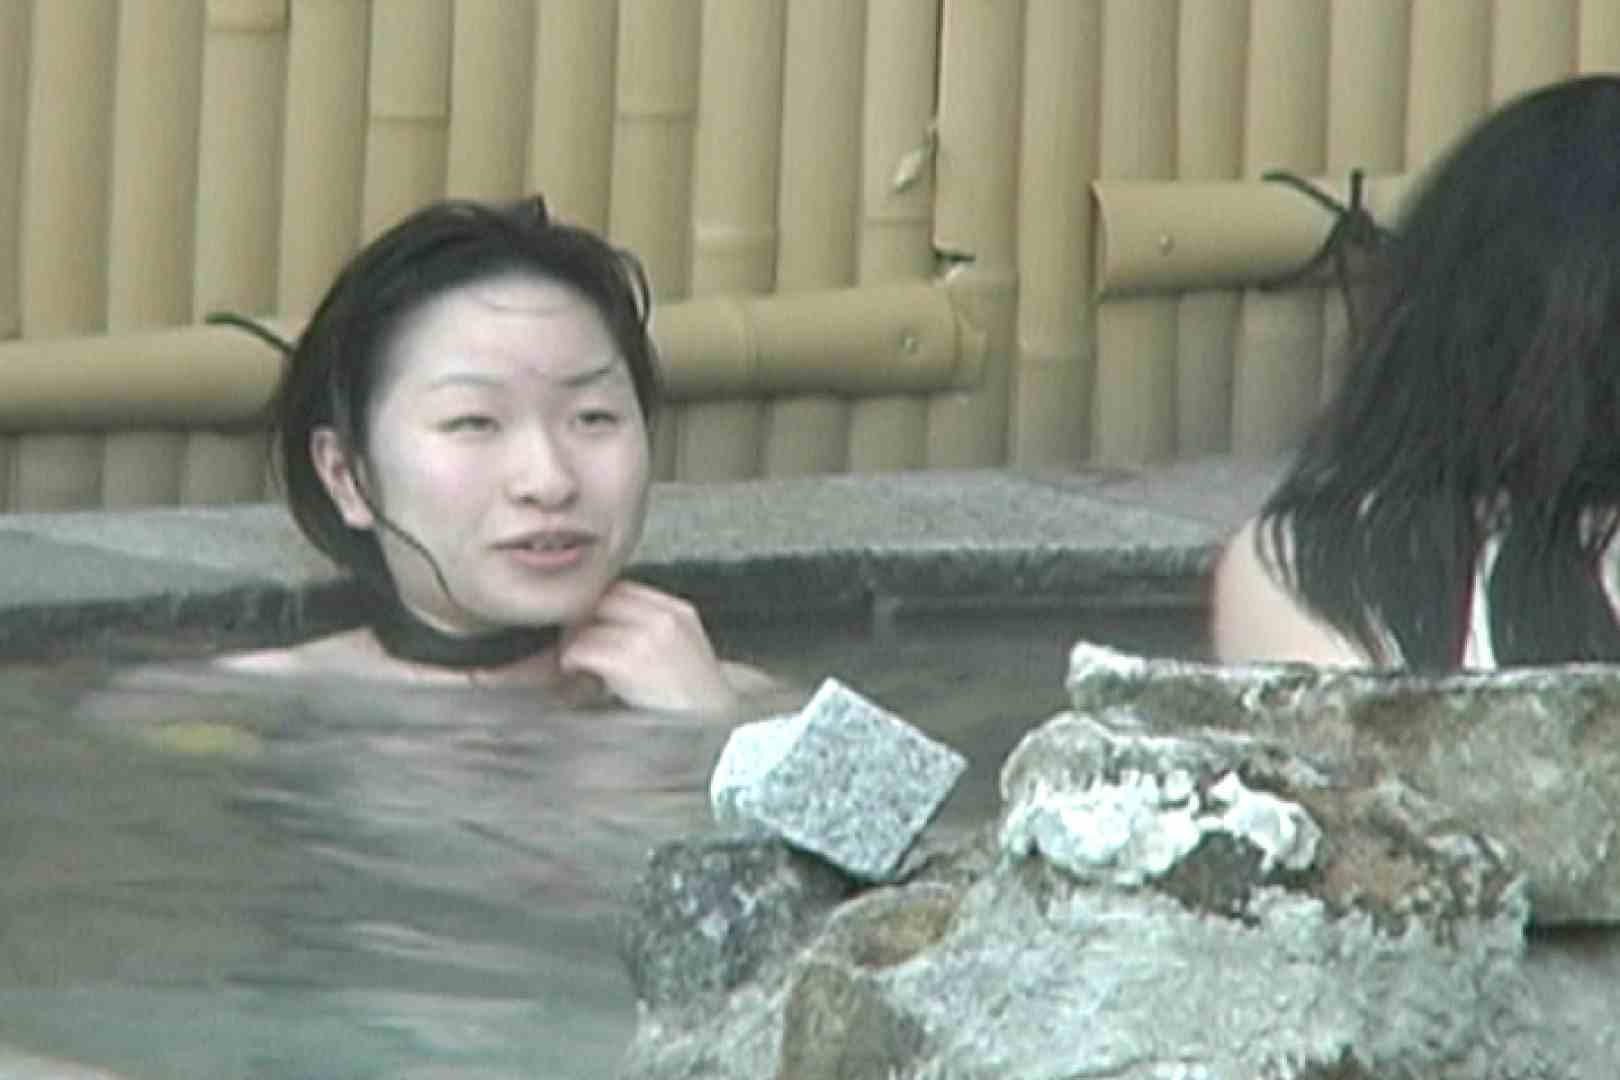 Aquaな露天風呂Vol.595 綺麗なOLたち エロ無料画像 112枚 98